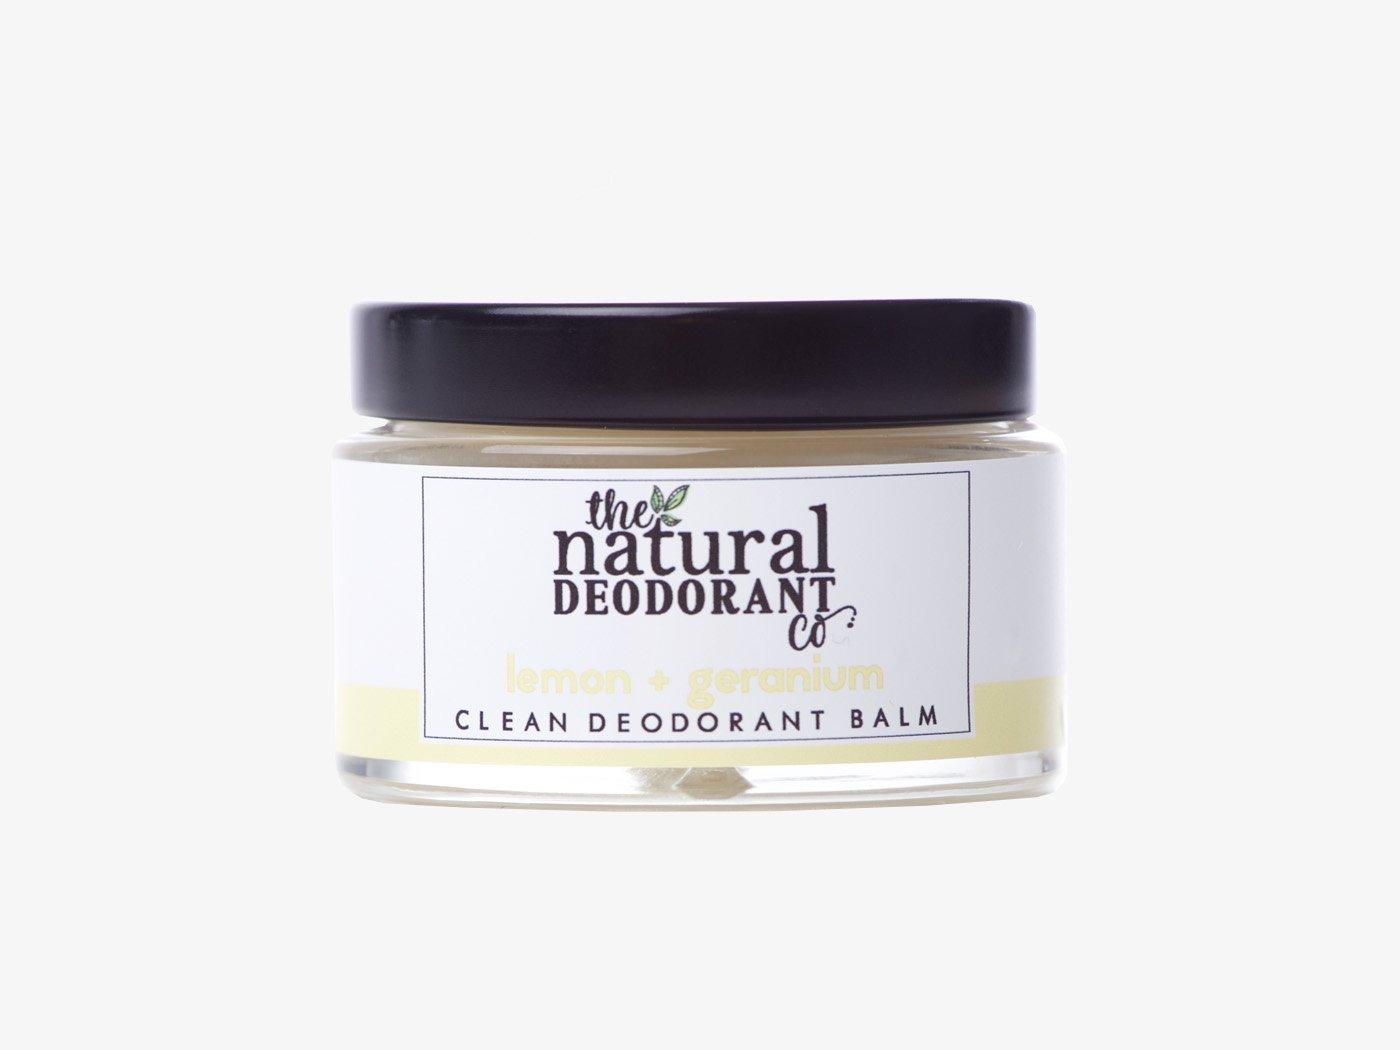 Lemon_Geranium_Clean_Deodorant_Balm_2800x.jpg